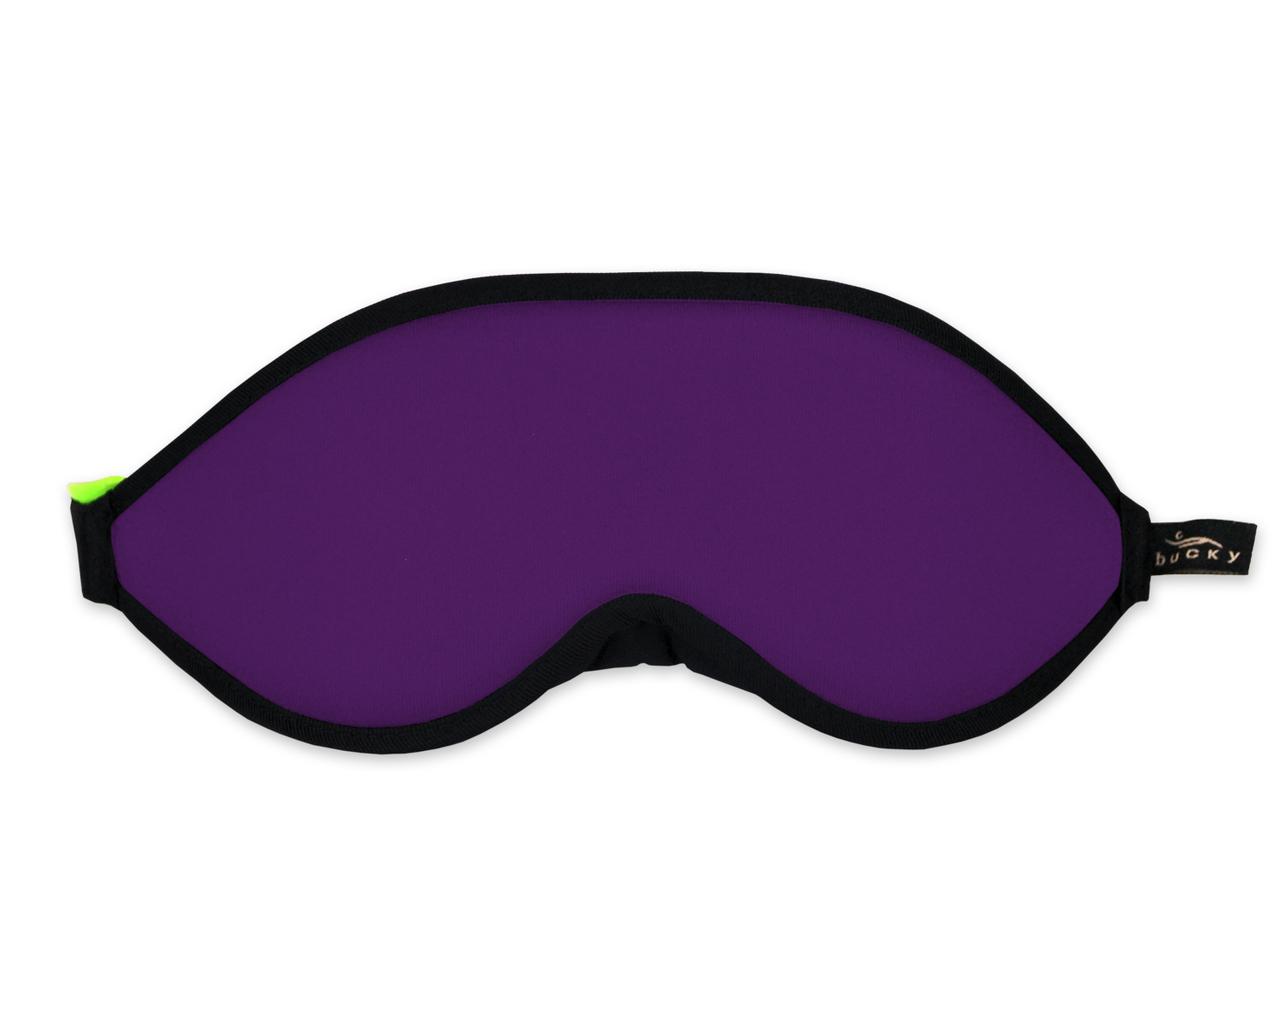 Bucky Blockout Eye Shades Sleep Mask with Earplugs